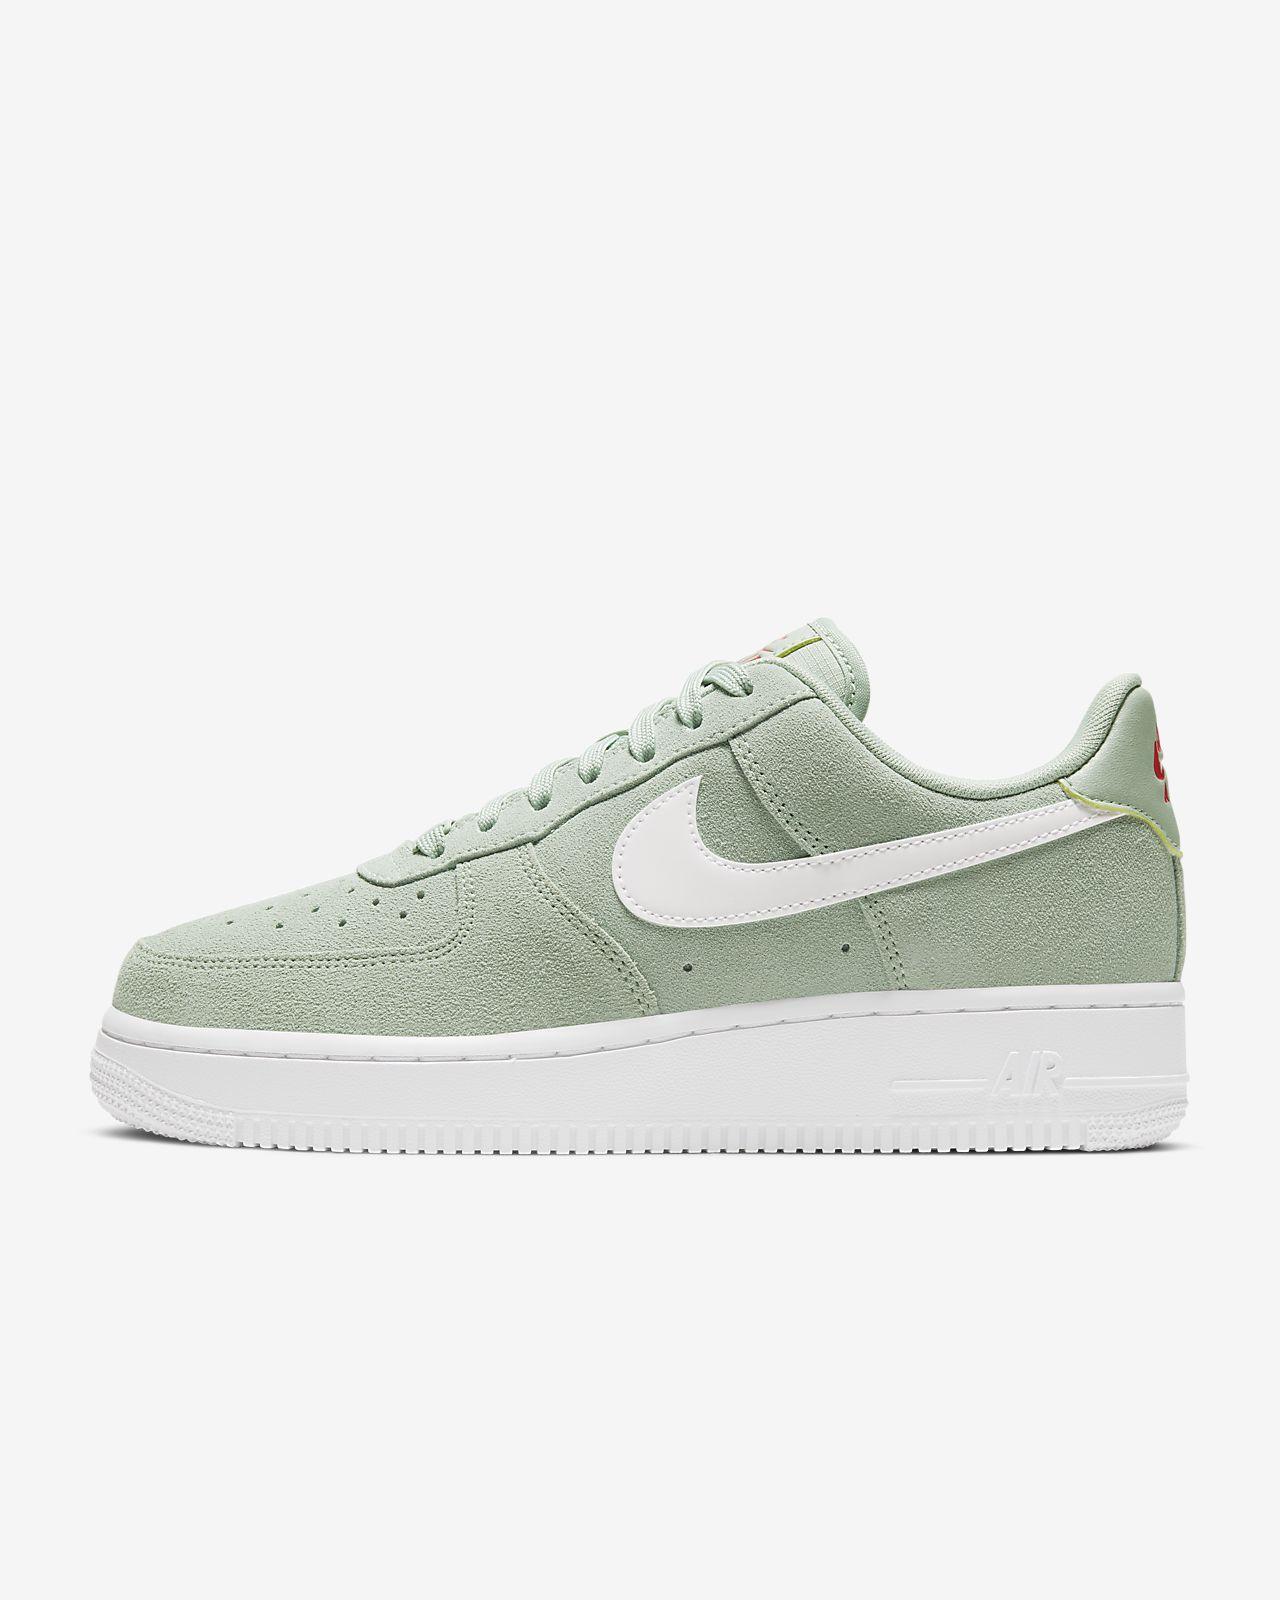 Tênis Nike Air Force 1 '07 Suede Feminino | Nike (com